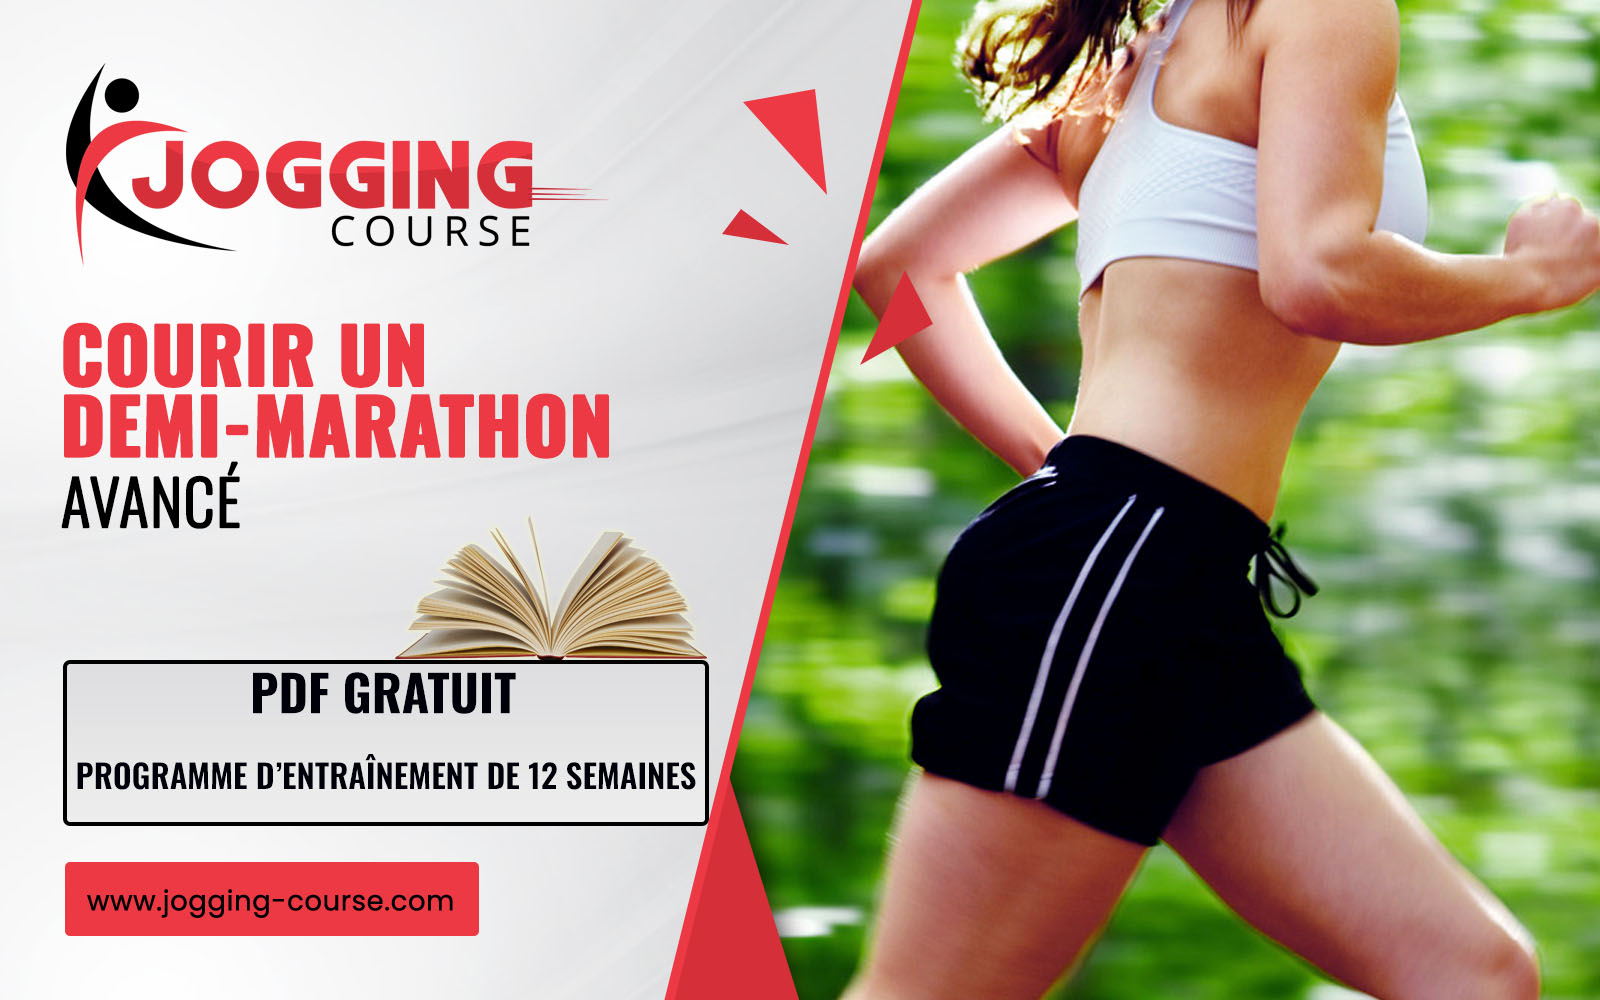 Programme demi-marathon (21.1 km) : Débutant avancé